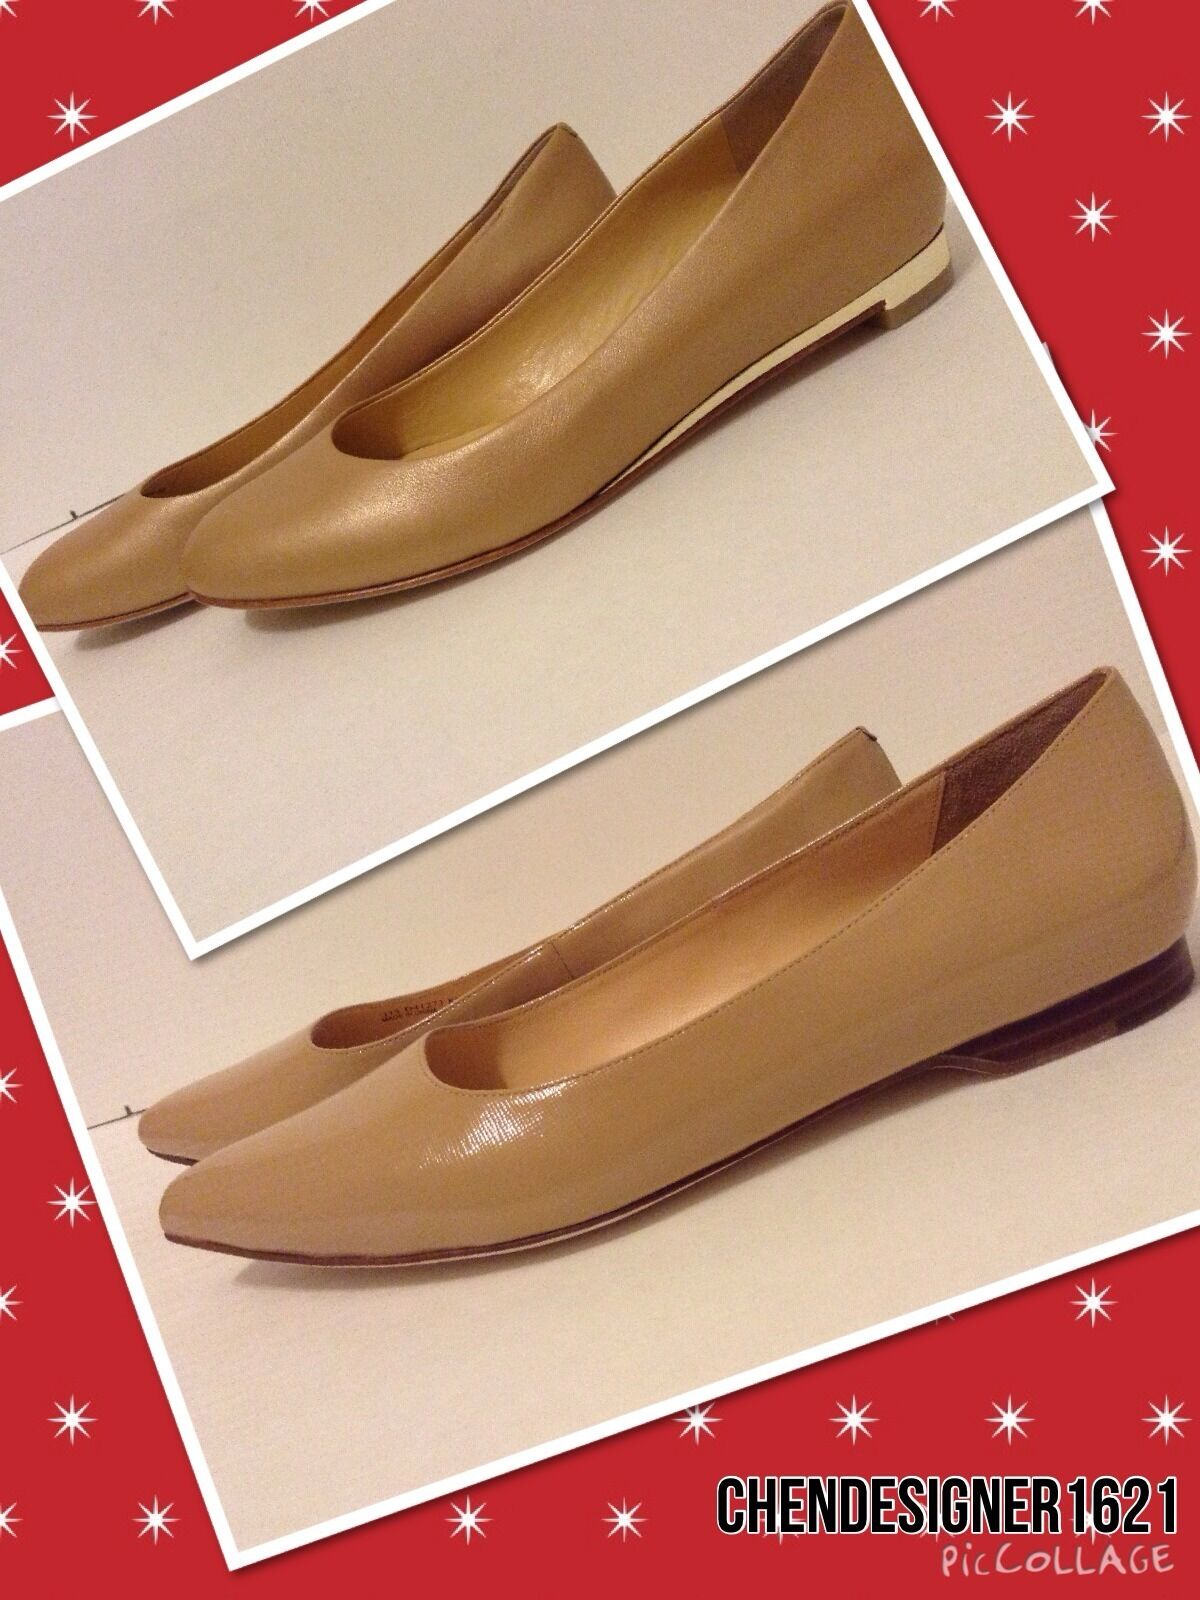 Cole Haan Dimensione 6, 8.5 US Magnolia or Astoria Skimmer nude Leather Flat scarpe